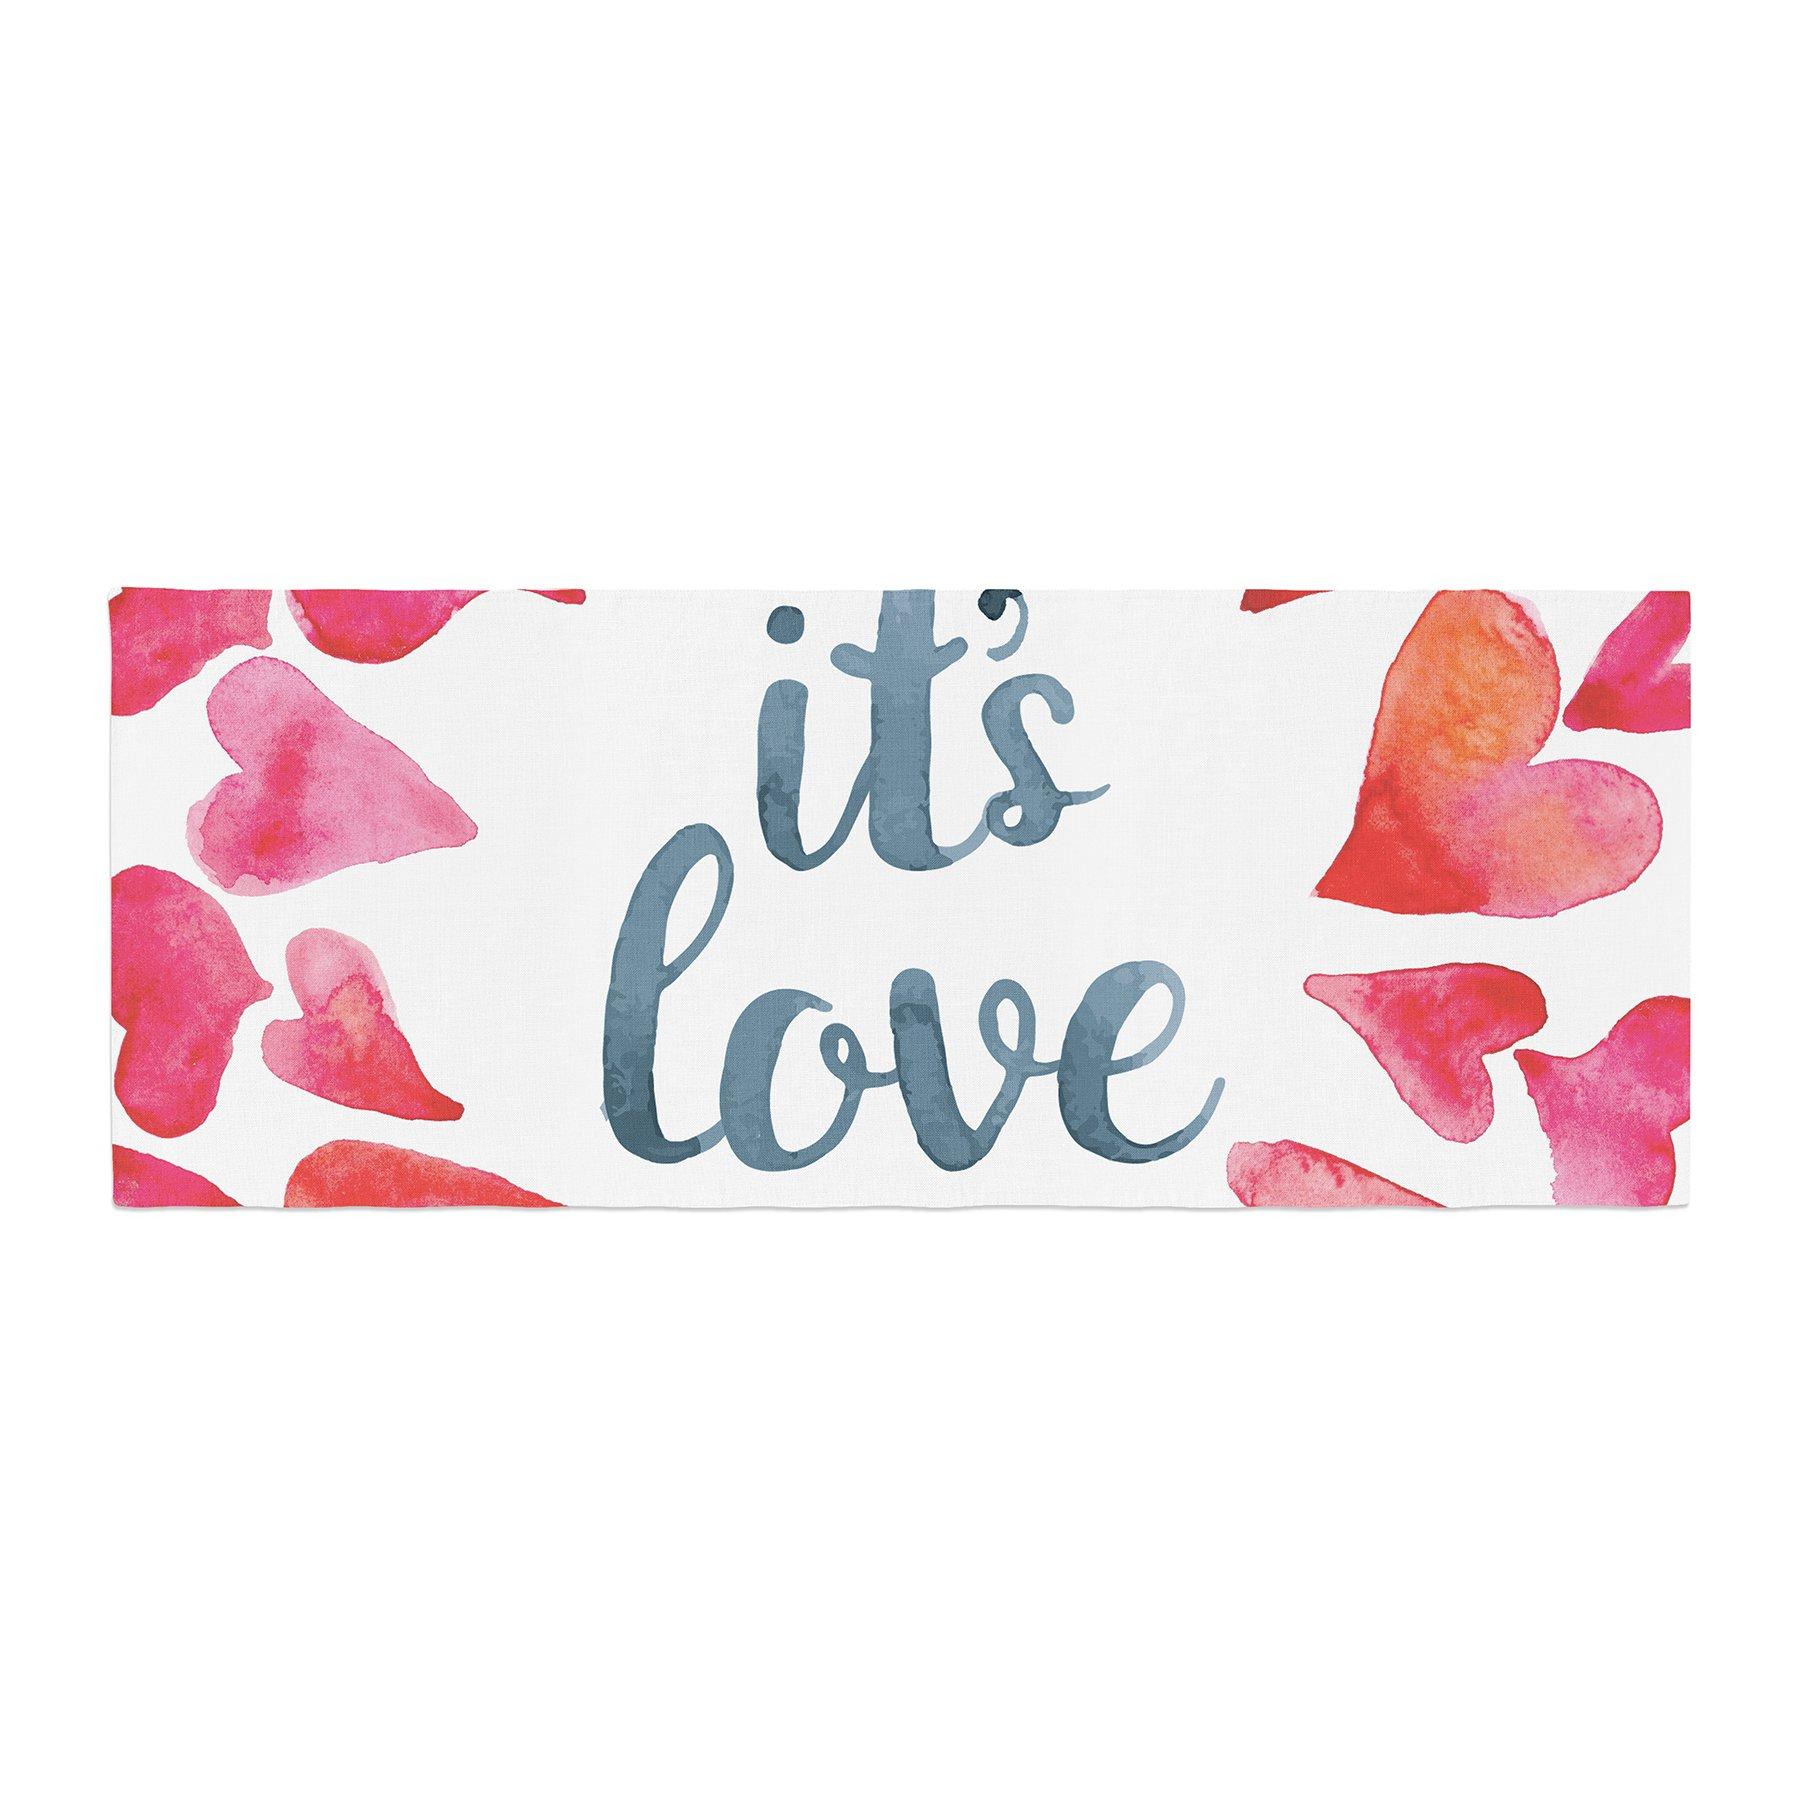 Kess InHouse KESS Original It's Love Red Pink Bed Runner, 34'' x 86'' by Kess InHouse (Image #1)